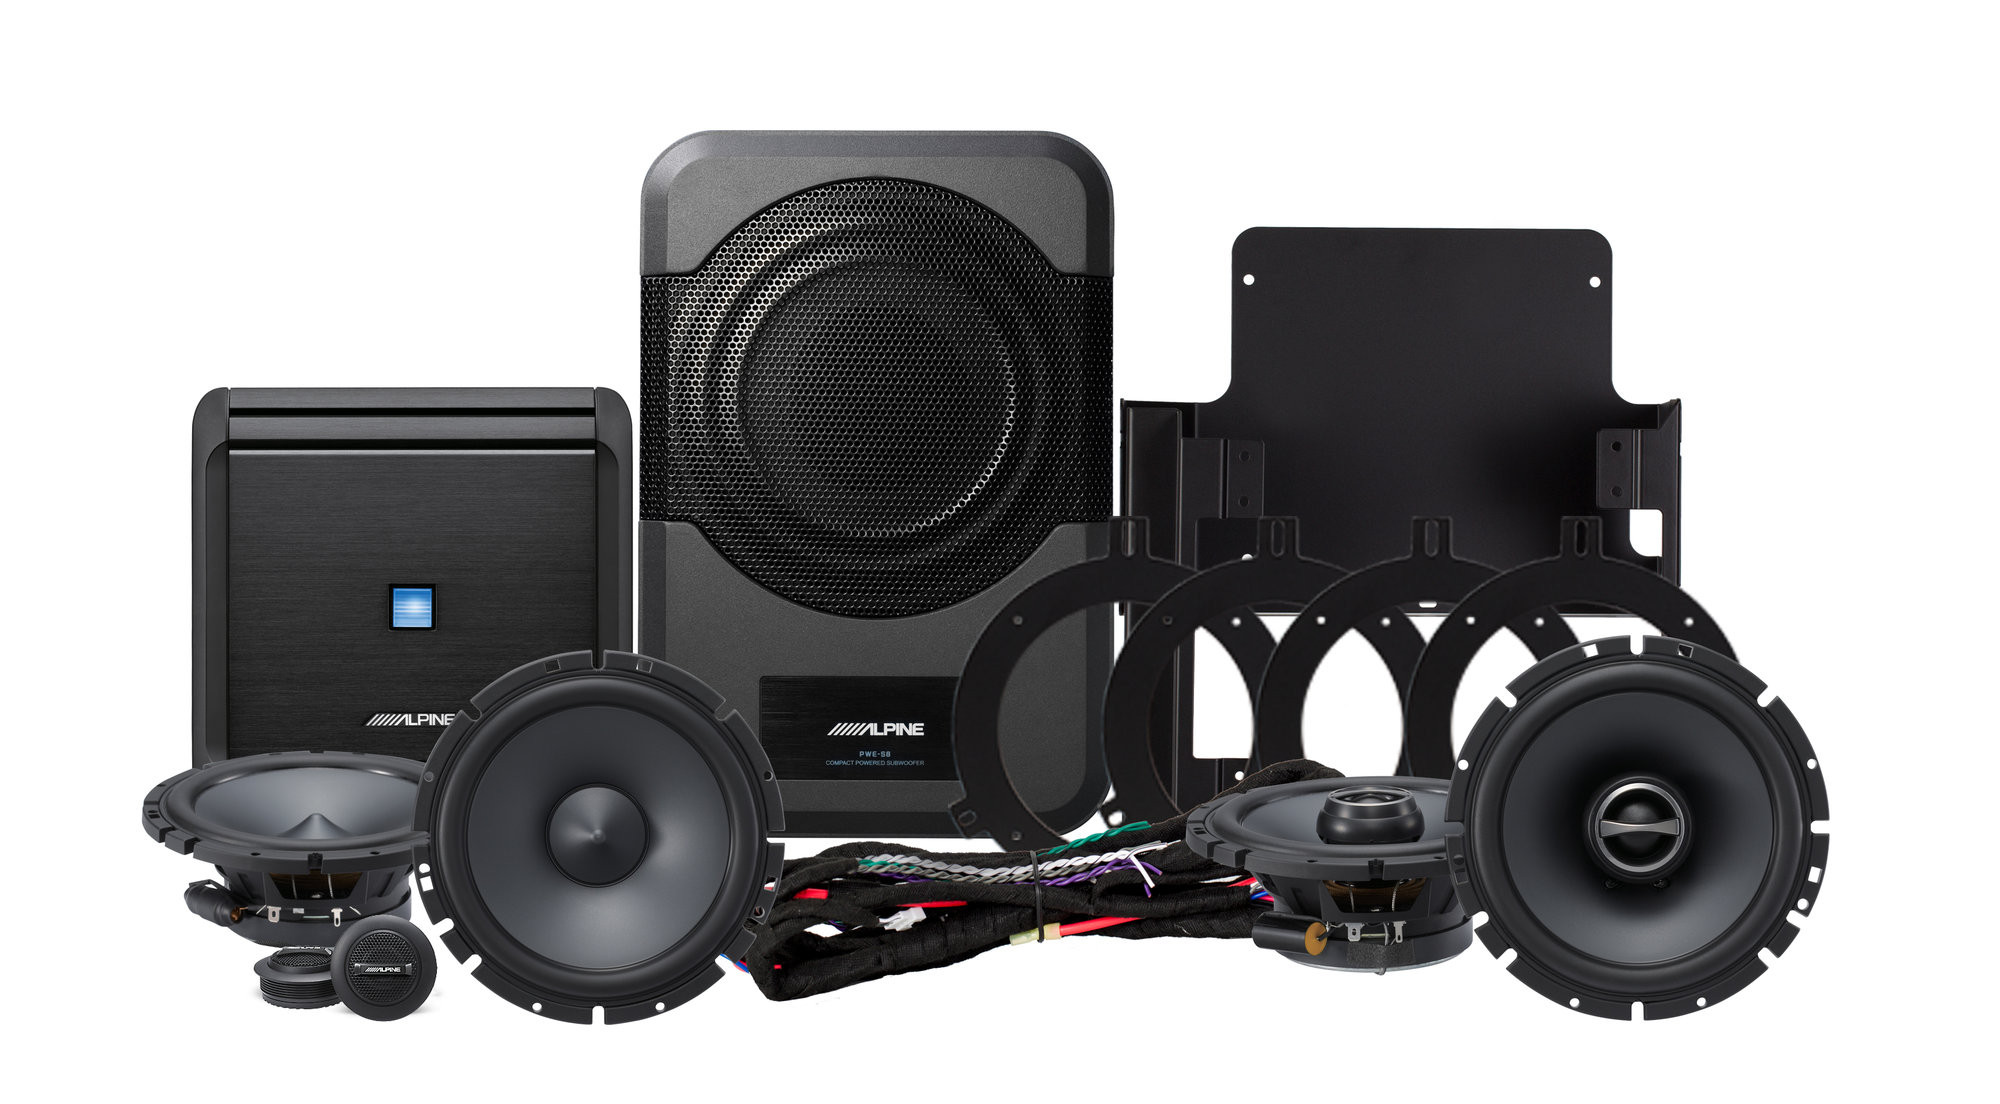 Alpine PSS-20WRA Full Sound System Upgrade For 2007-14 Jeep Wrangler JK Unlimited 4 Door Models PSS-20WRA